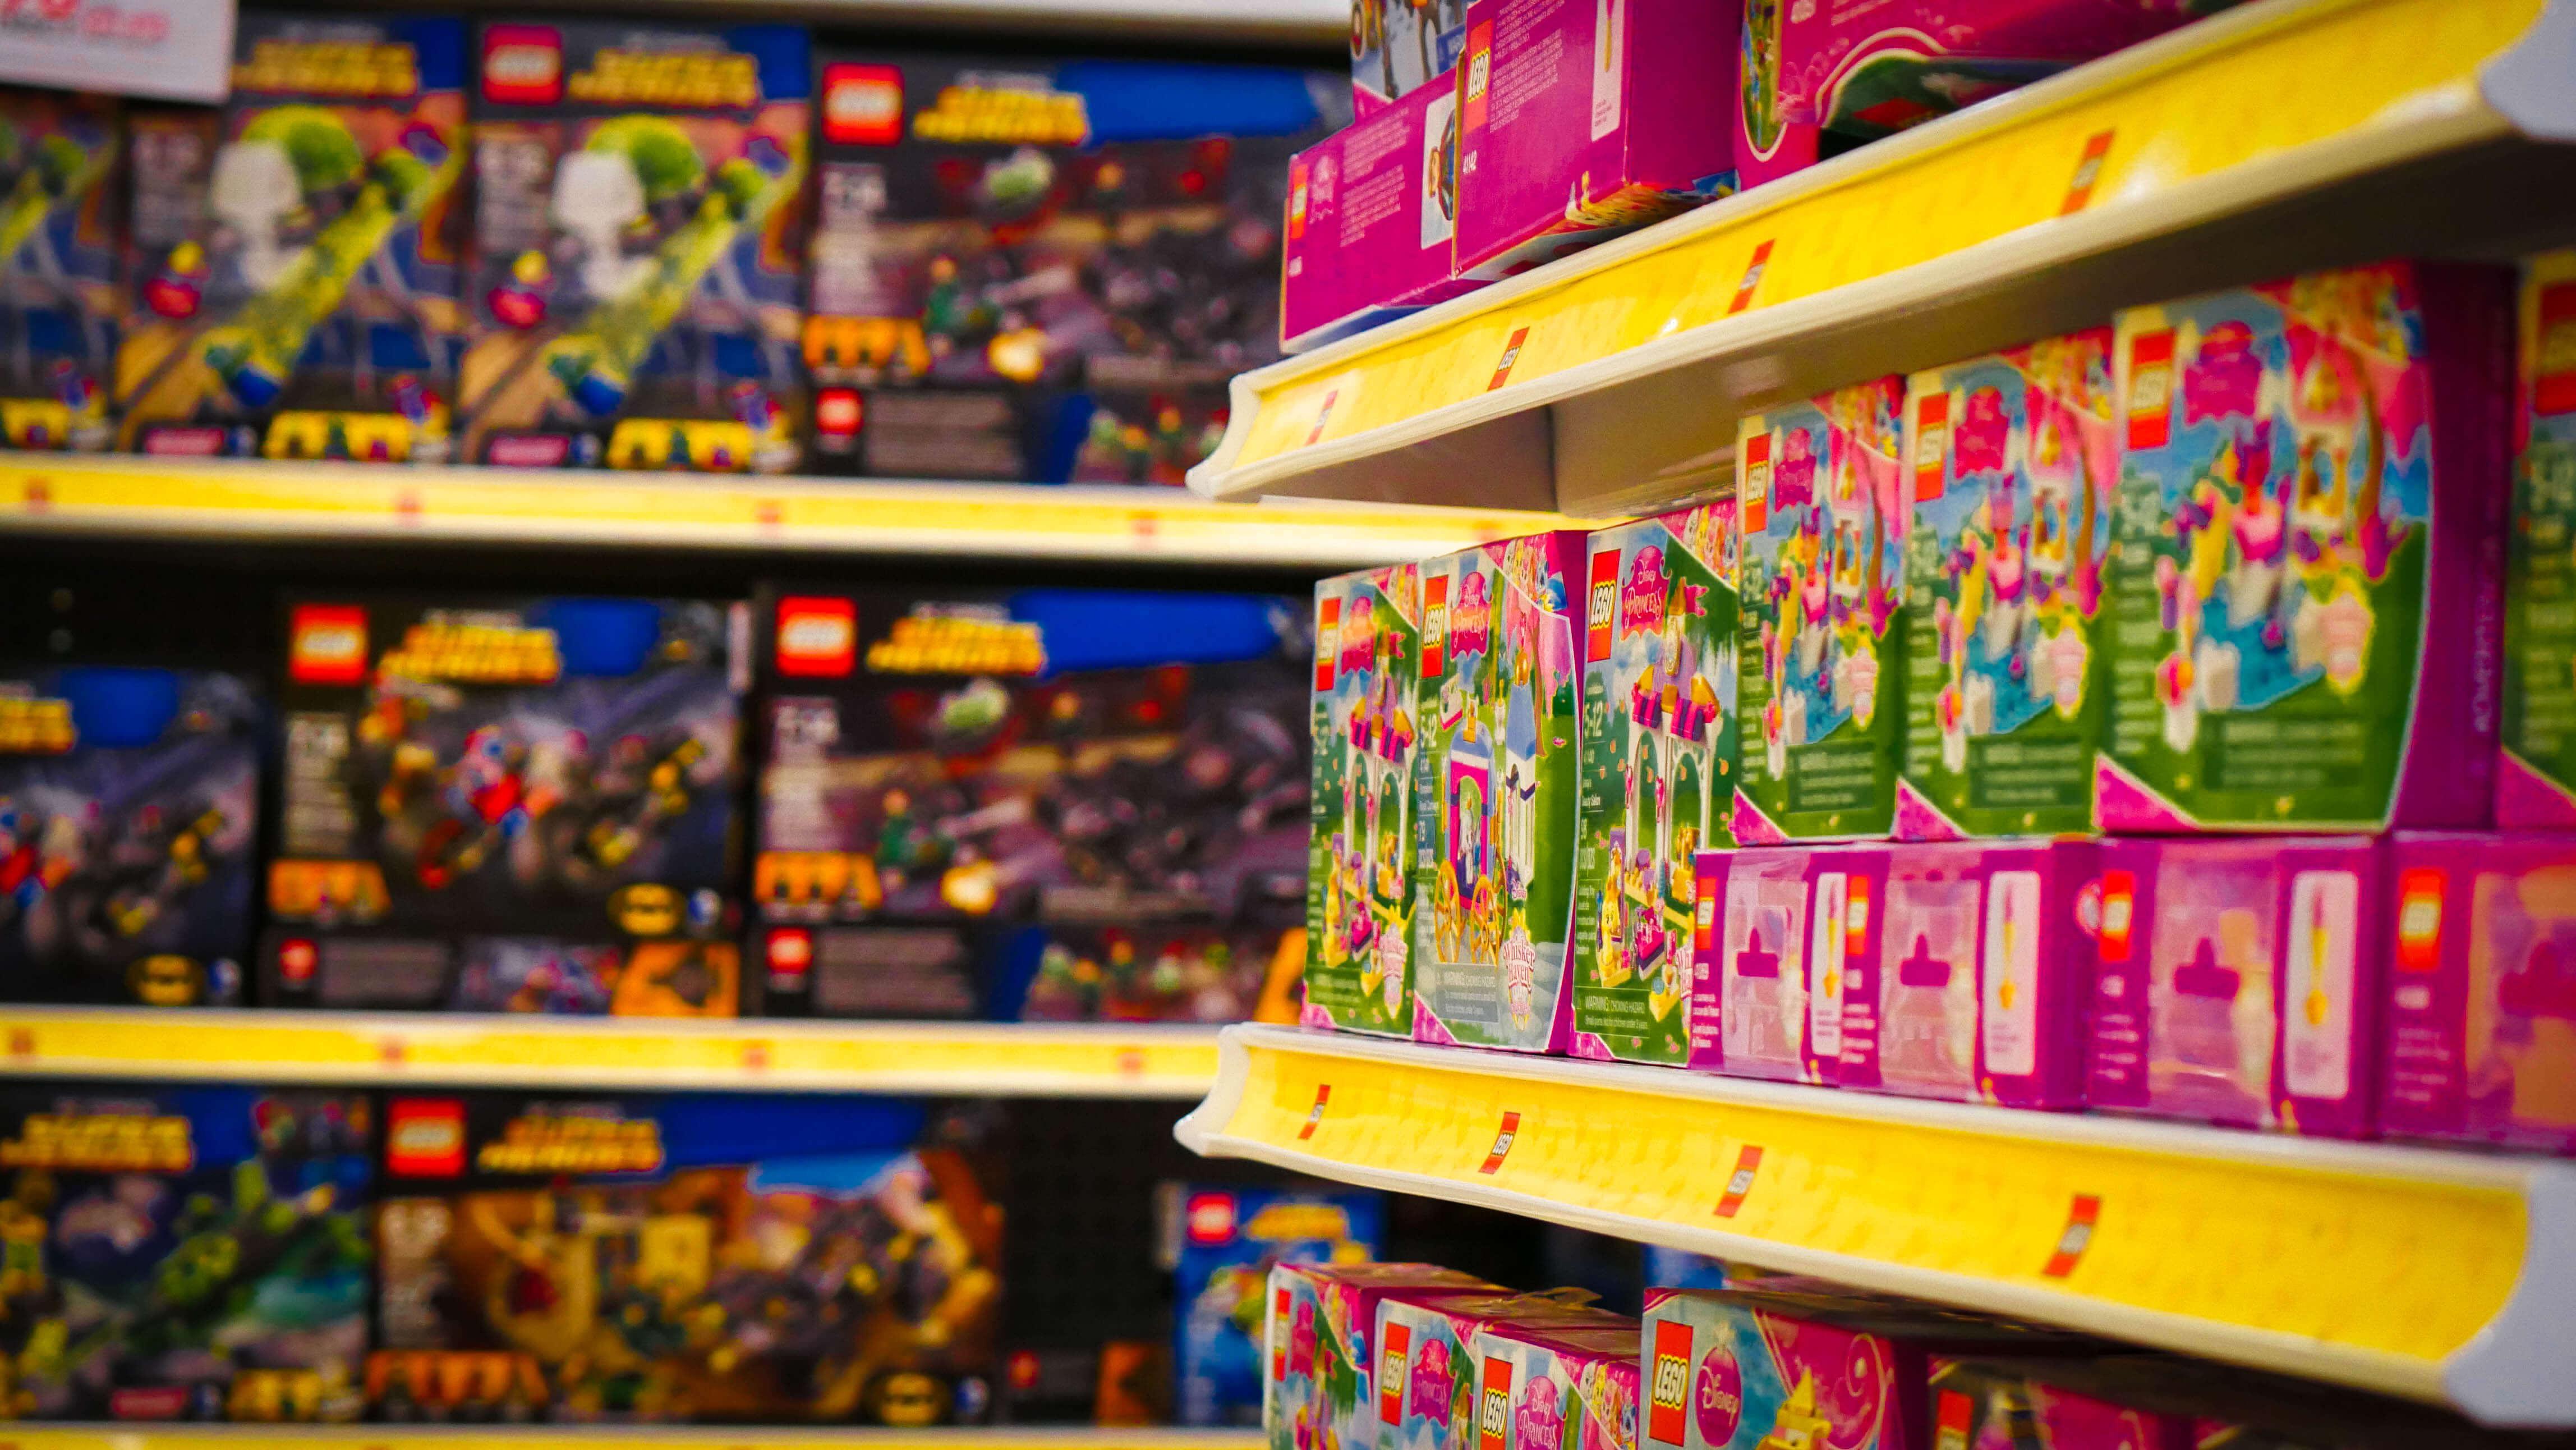 "CrisisLanzan ""juguetes Del Día NiñoPor Infoback La Accesibles"" OkXuPZi"